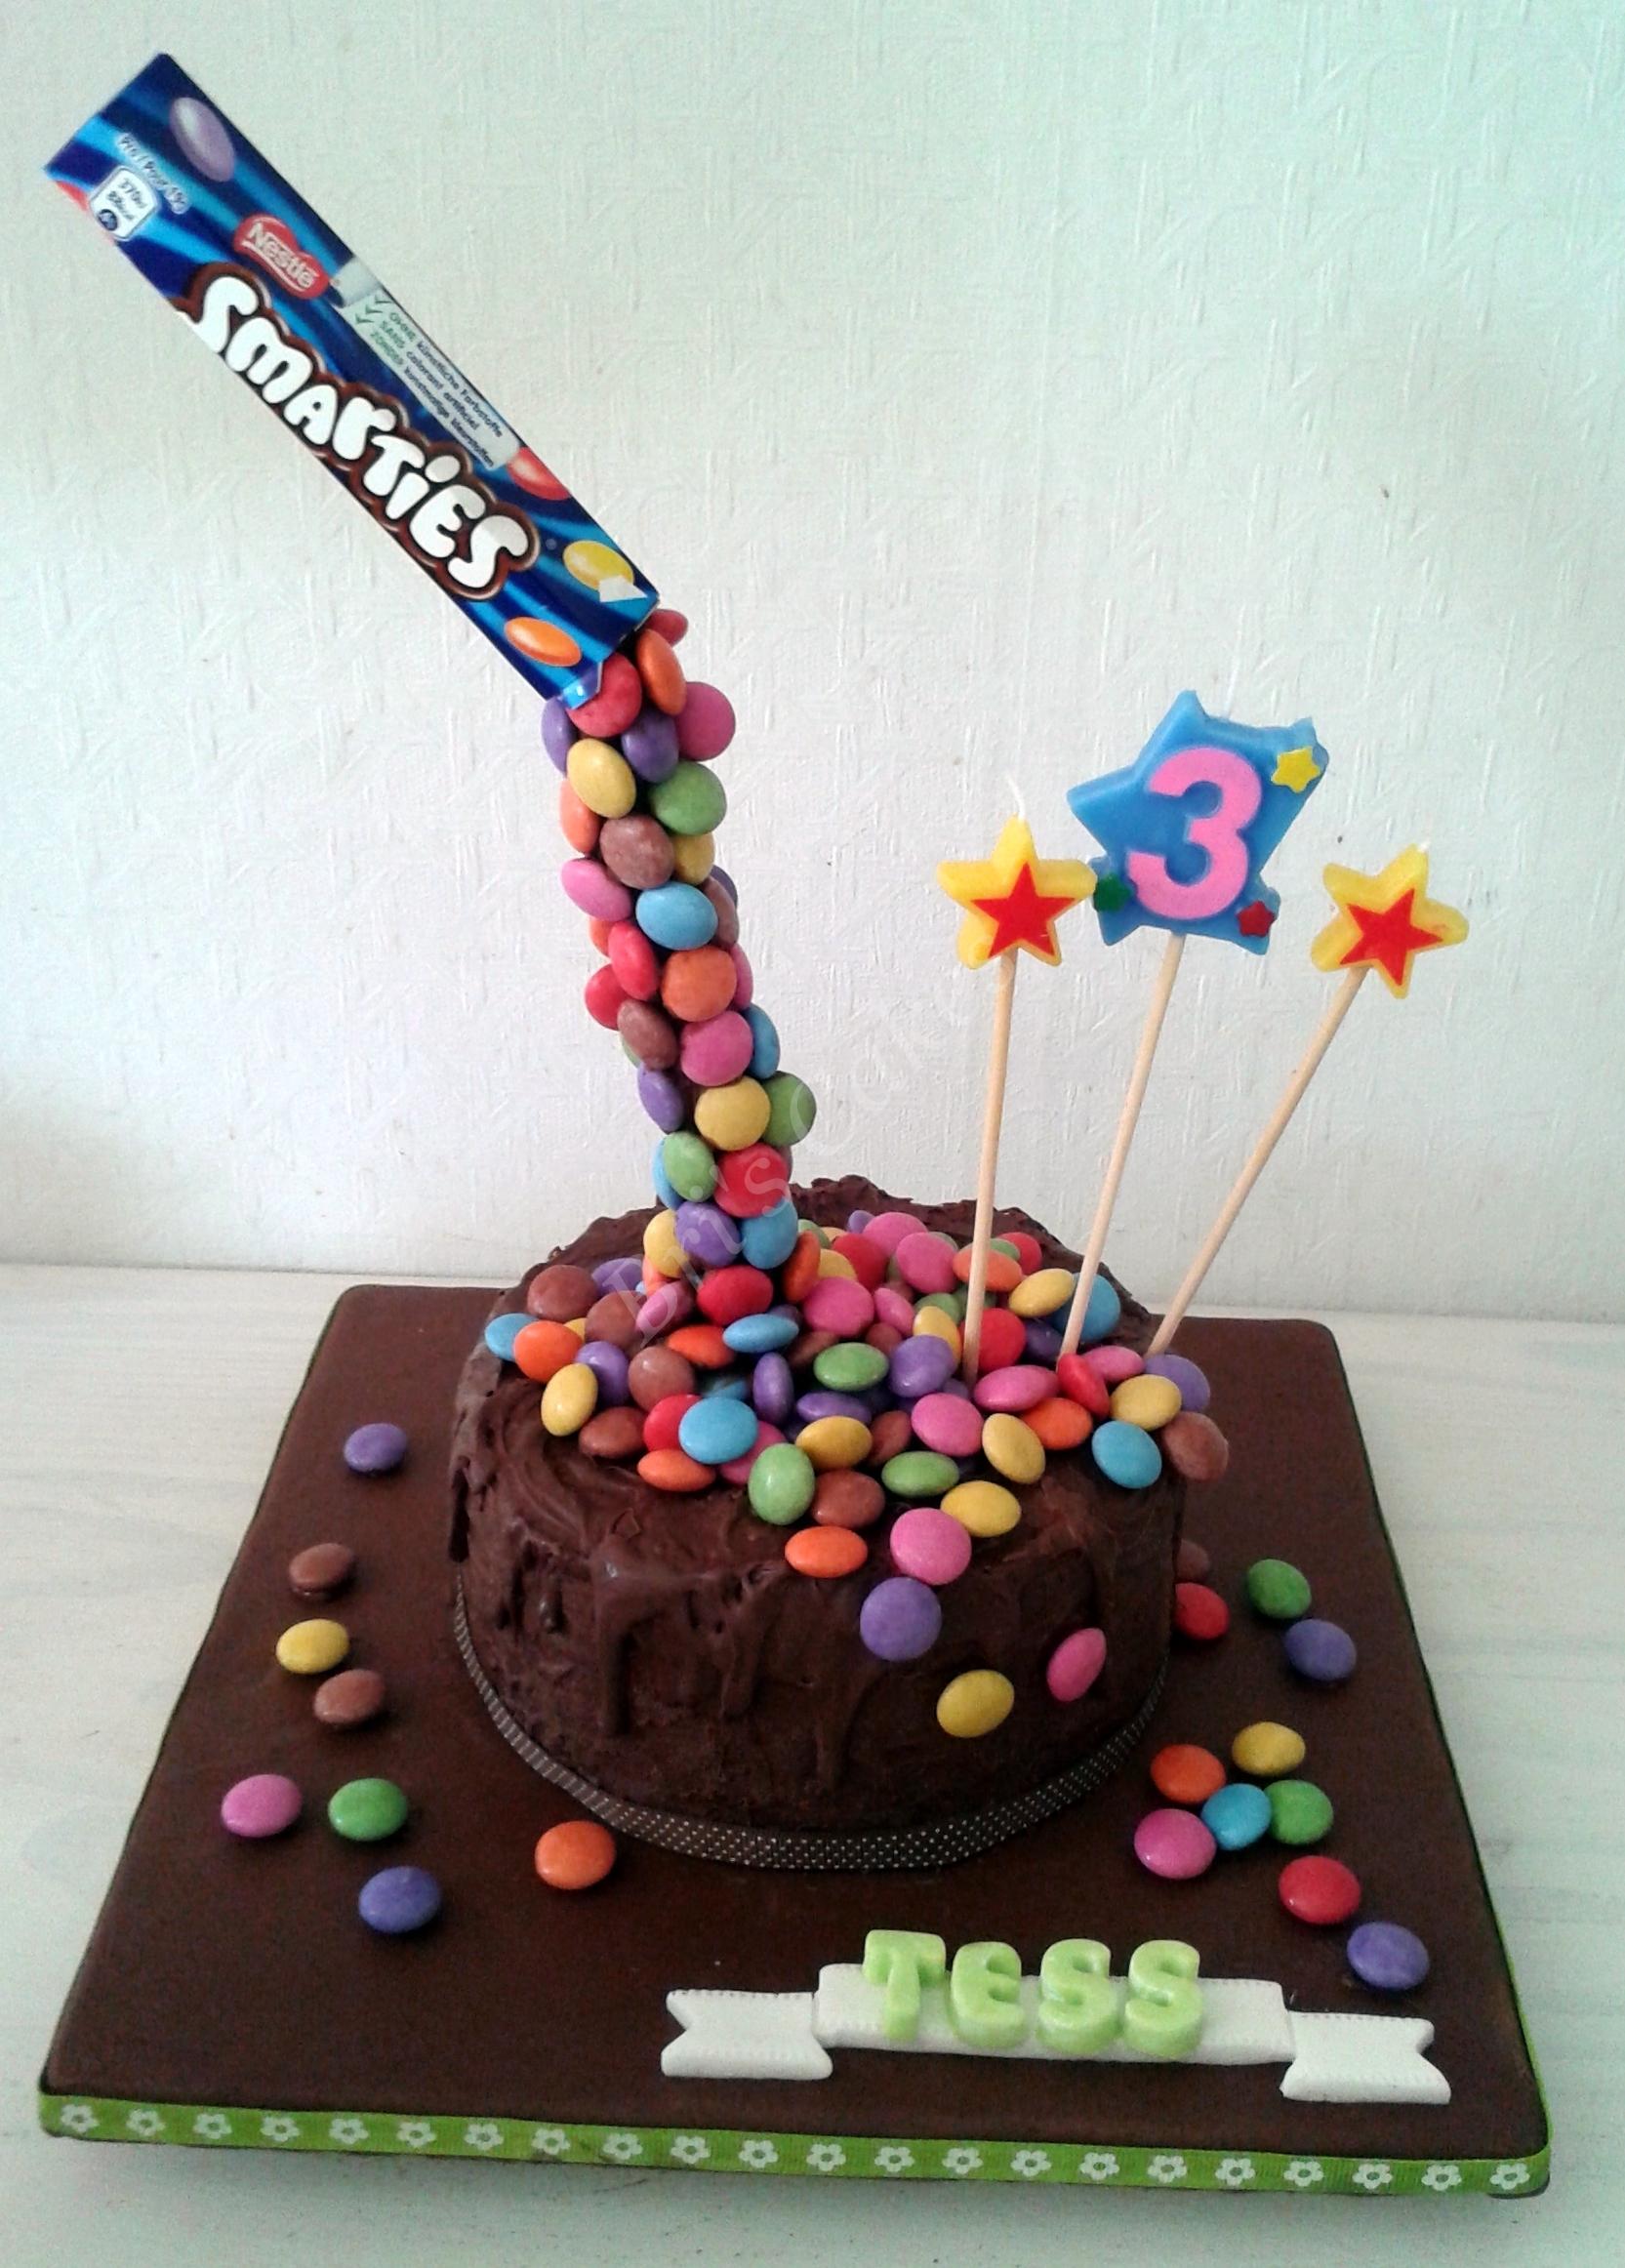 Huummm Une Avalanche De Smarties Bri S Cakes